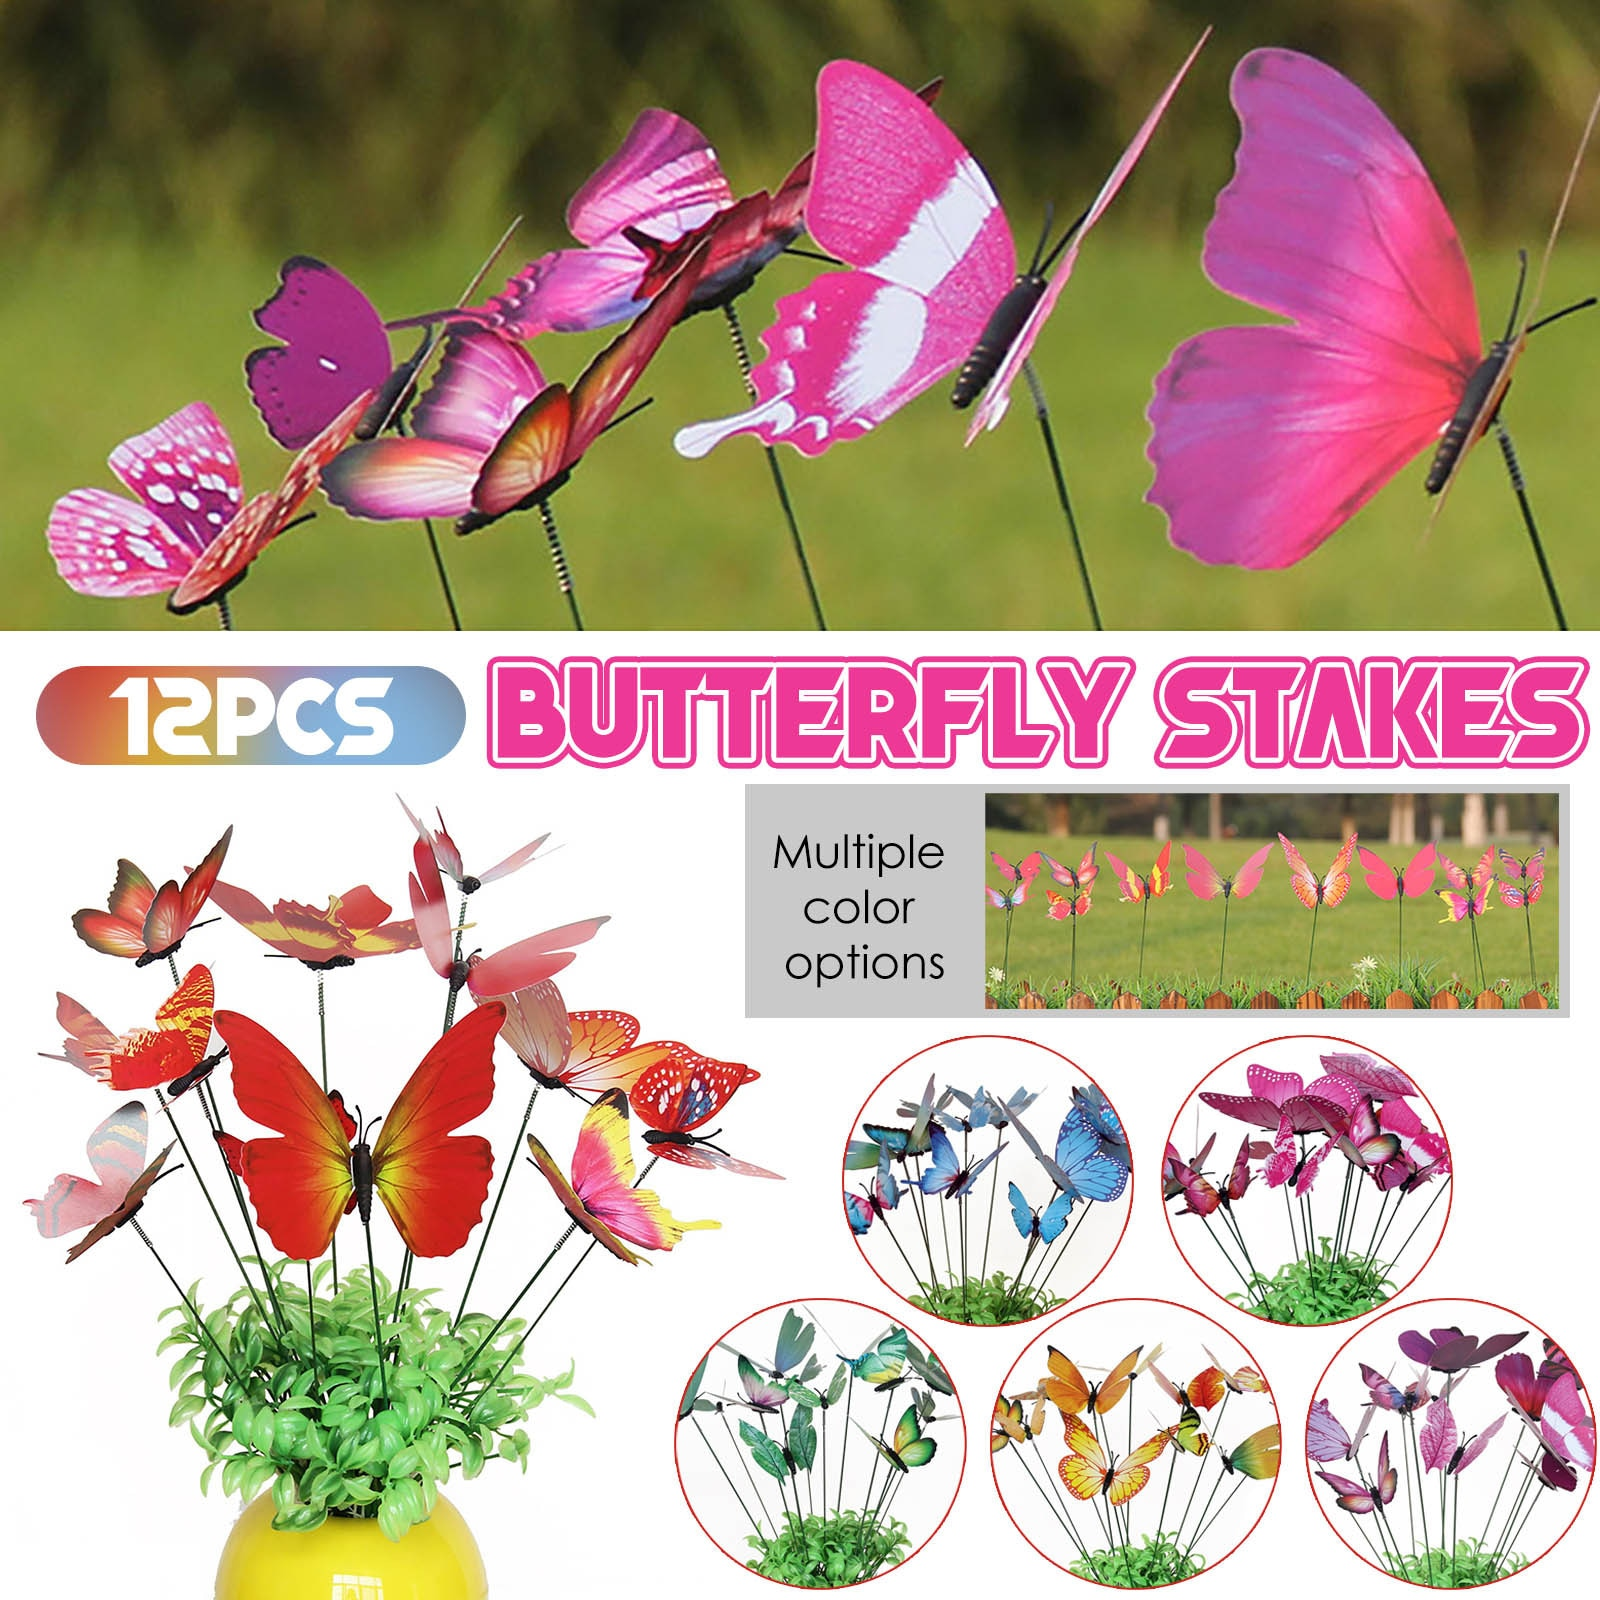 12pcs/lot Butterflies Garden Yard Planter Colorful Whimsical Butterfly Stakes Decoracion Outdoor Decor Flower Pots Decoration